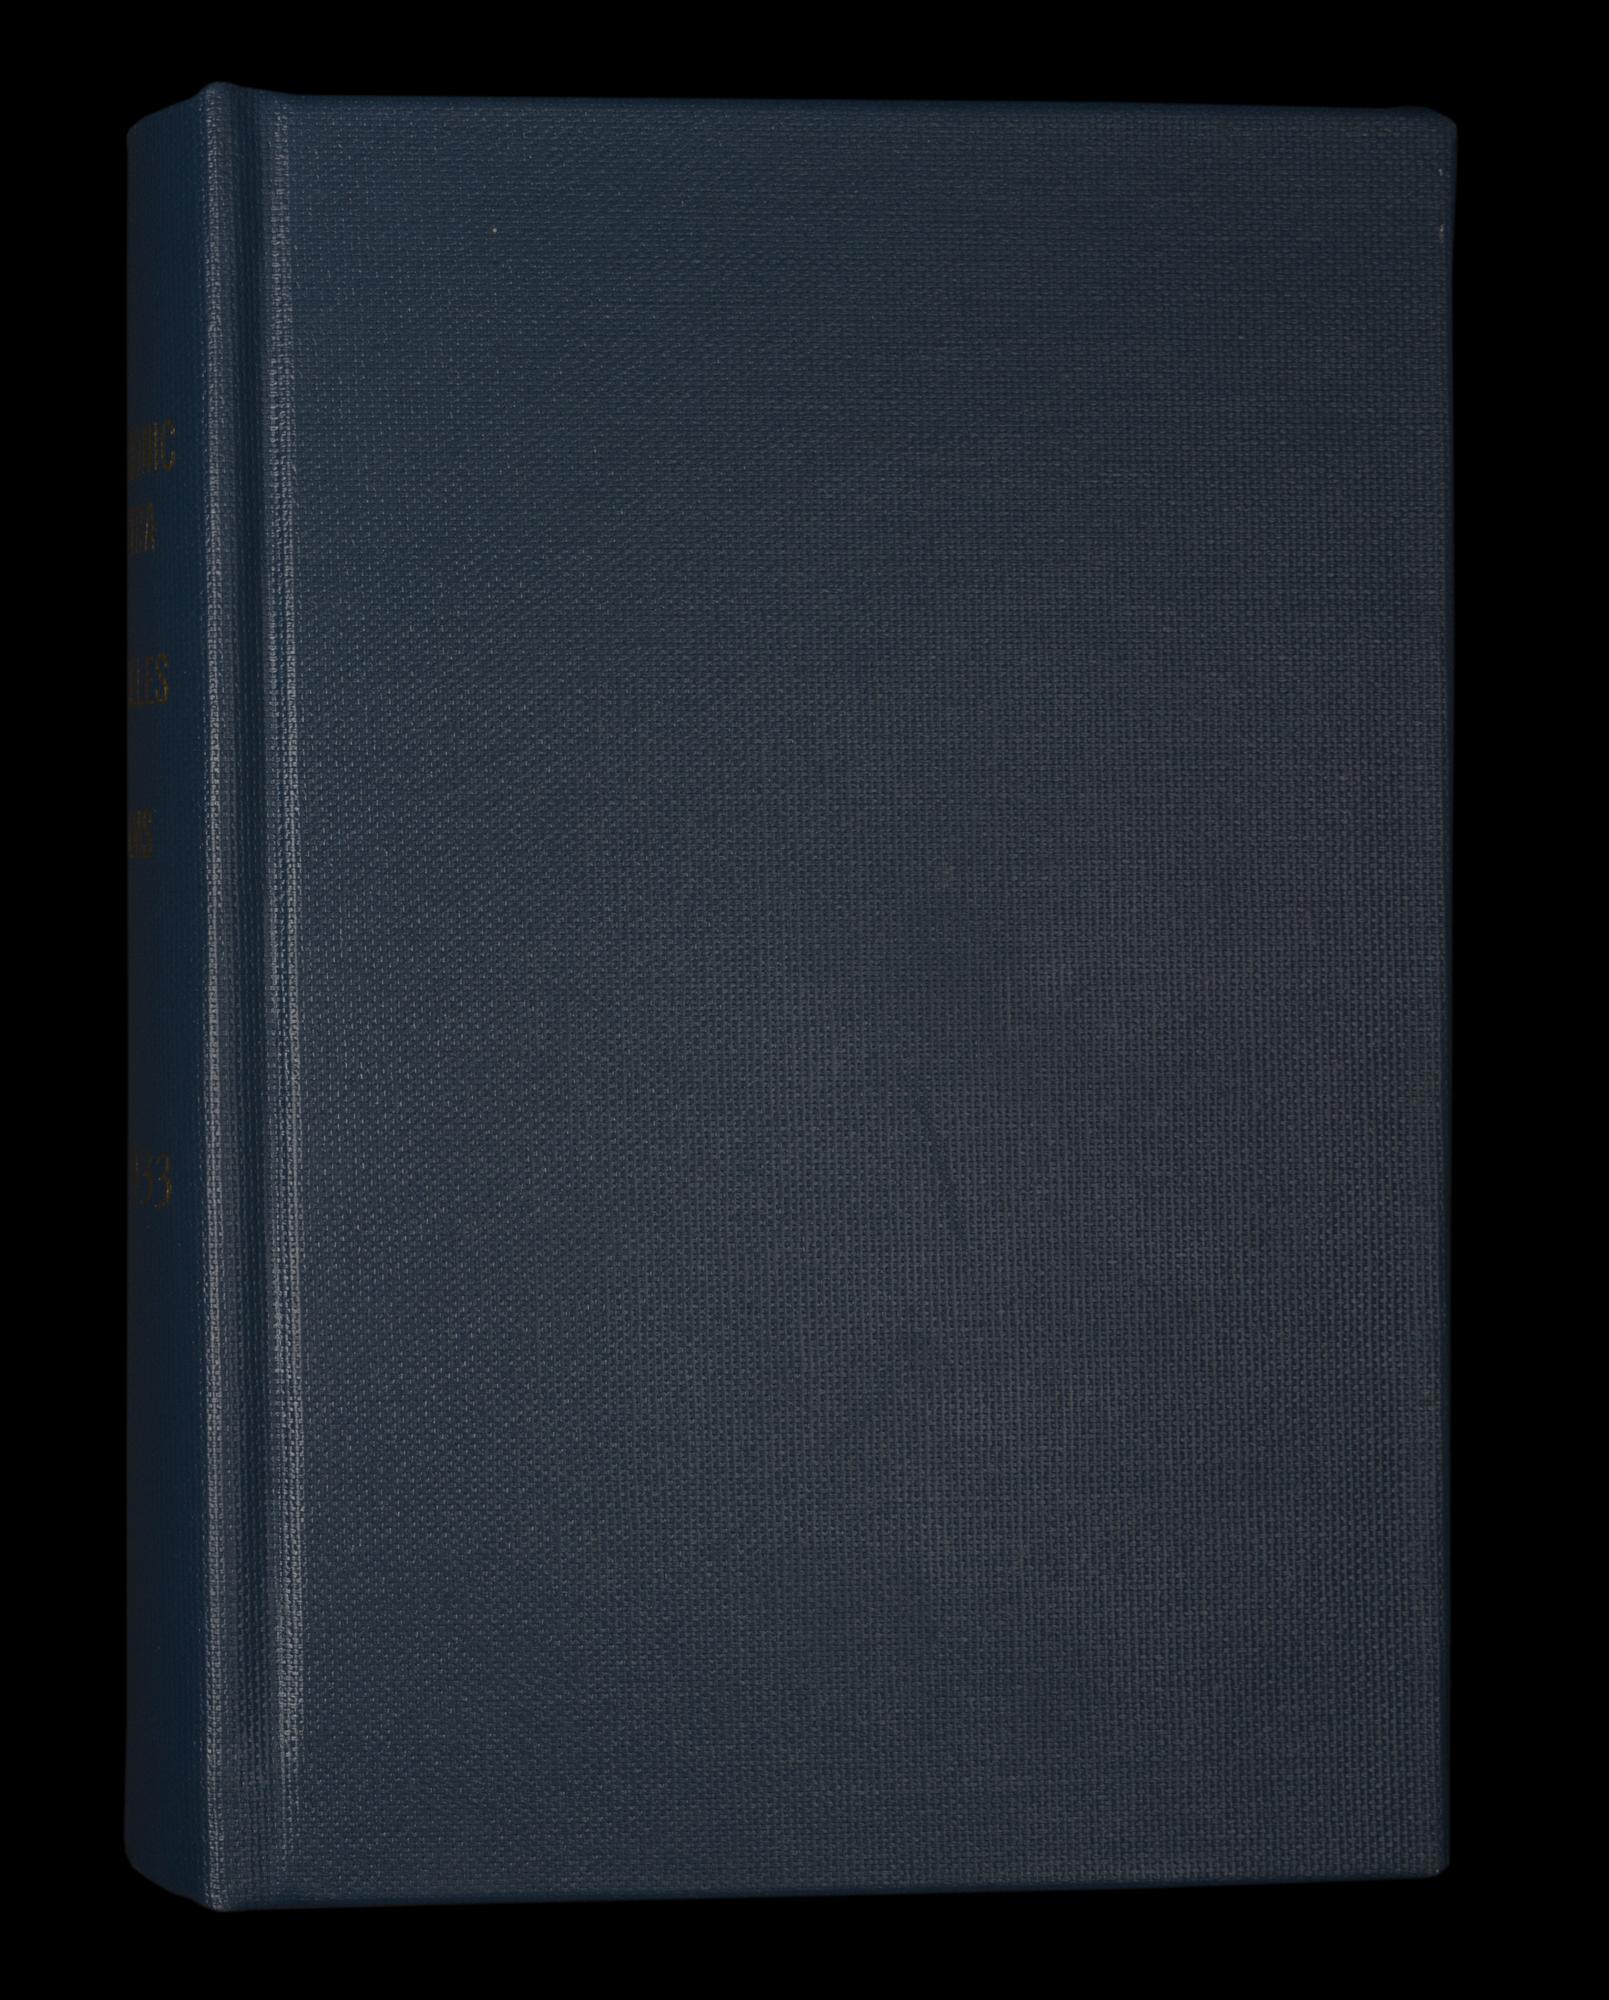 LAPO_ProgramBook_Cover_1929-1930.jpg